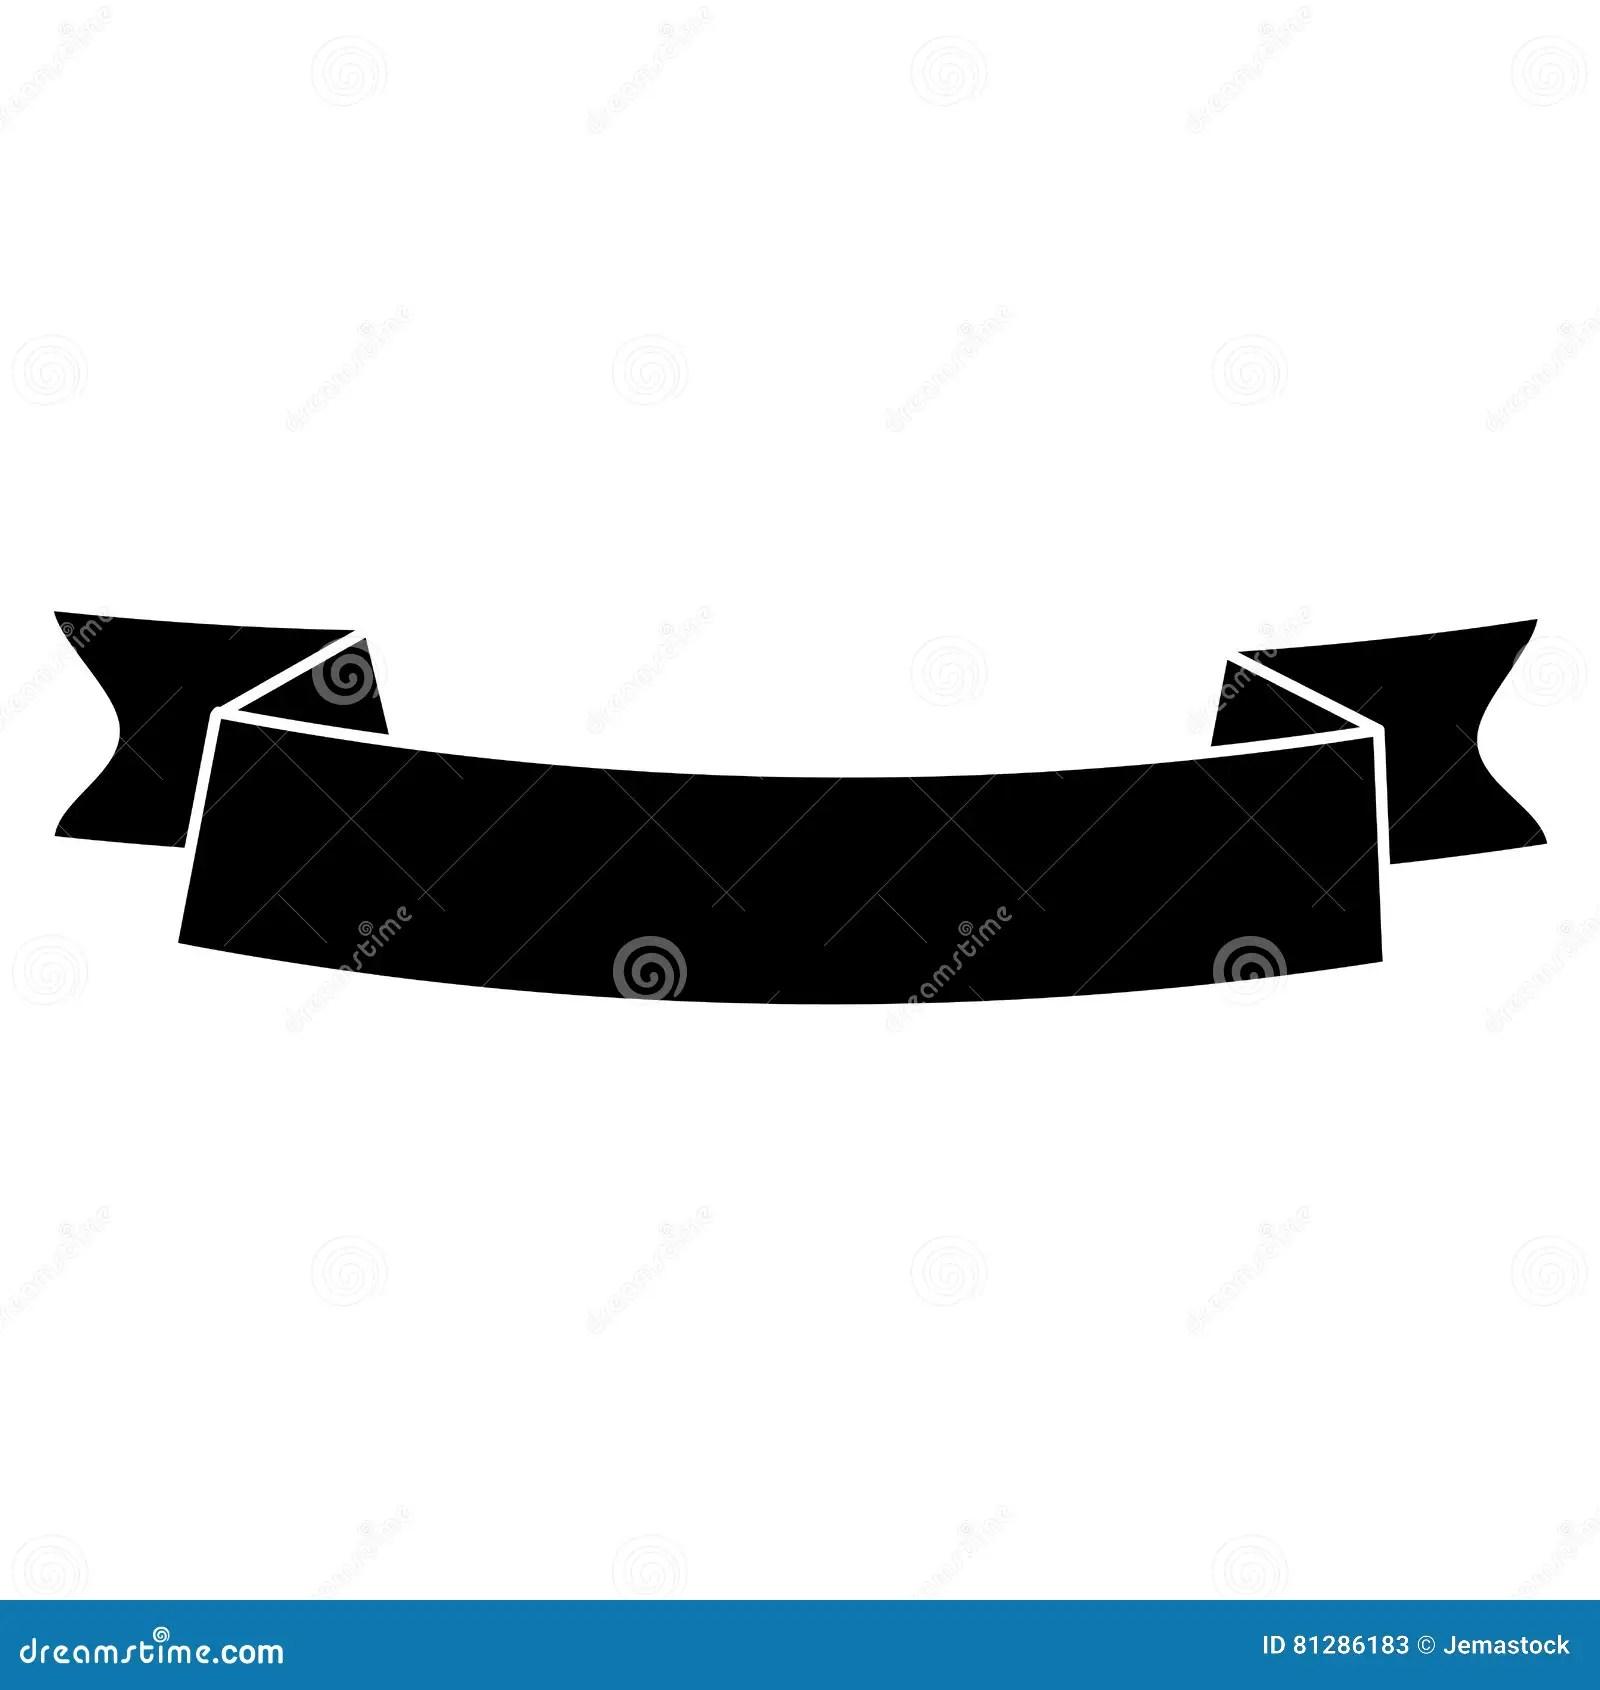 hight resolution of silhouette ribbon banner black empty design stock illustrations 176 silhouette ribbon banner black empty design stock illustrations vectors clipart